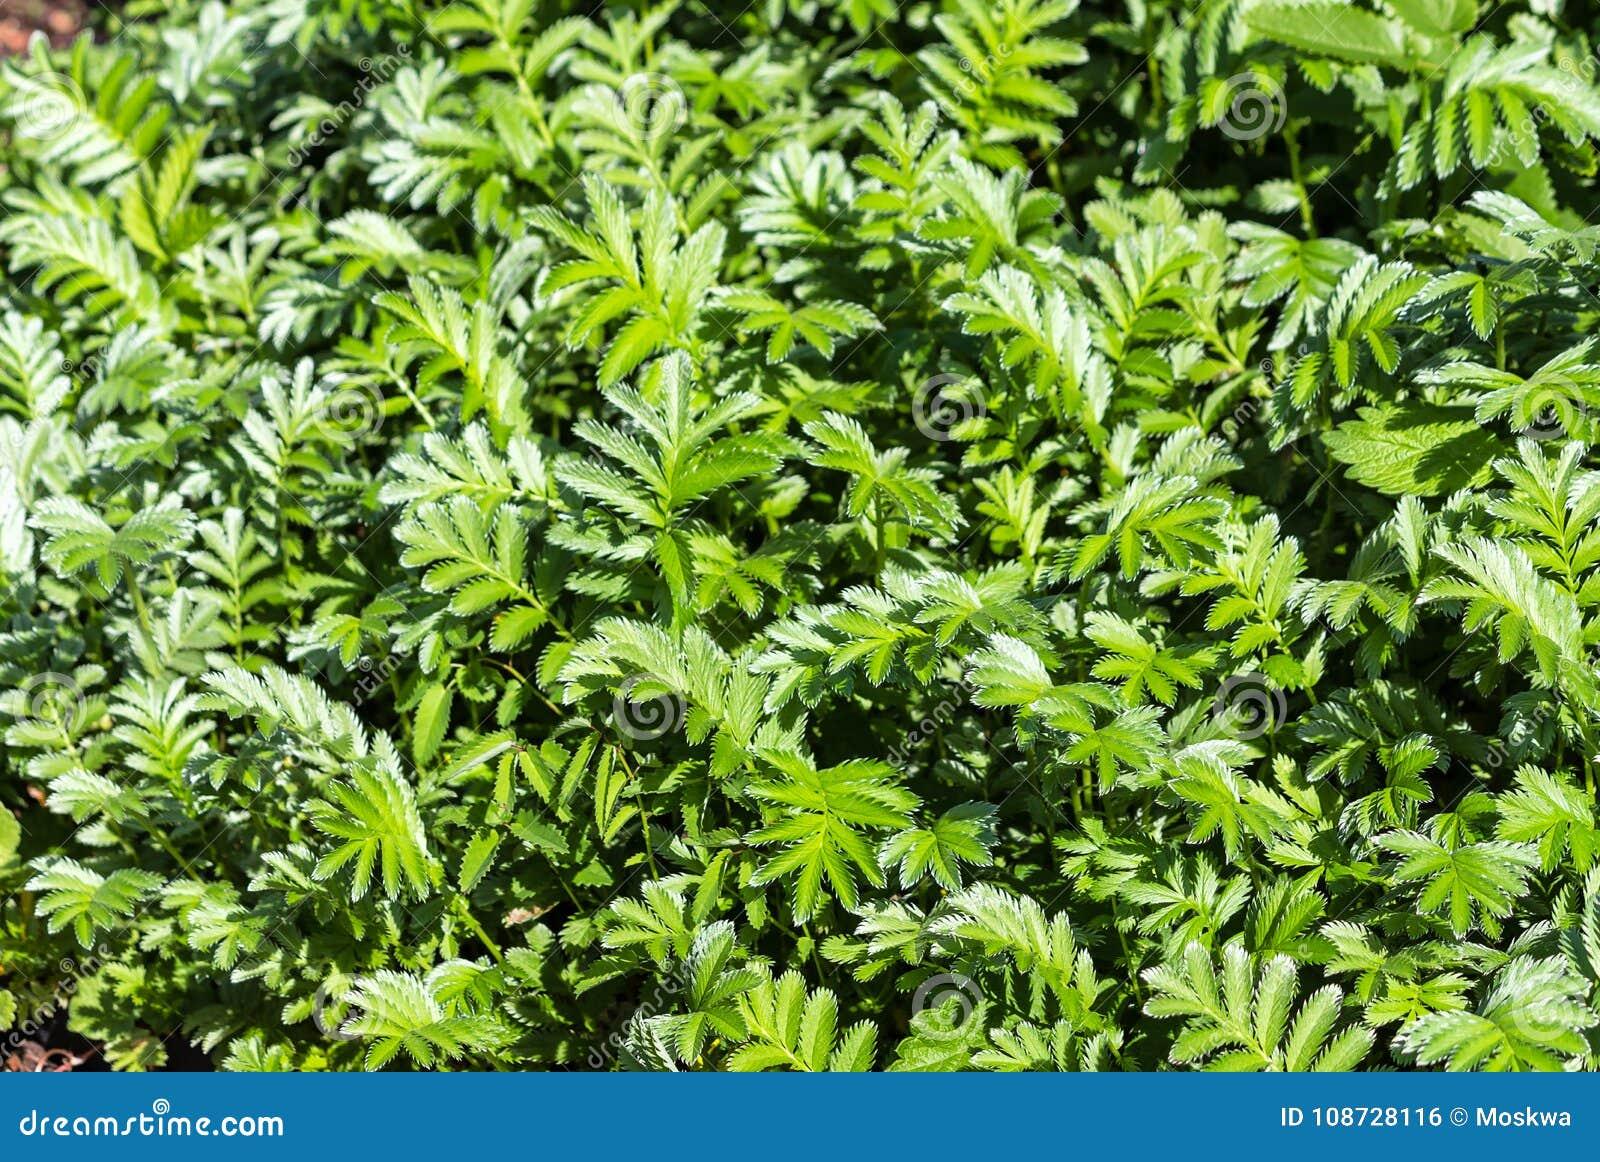 Silverweed shrub. Most popular varieties 99